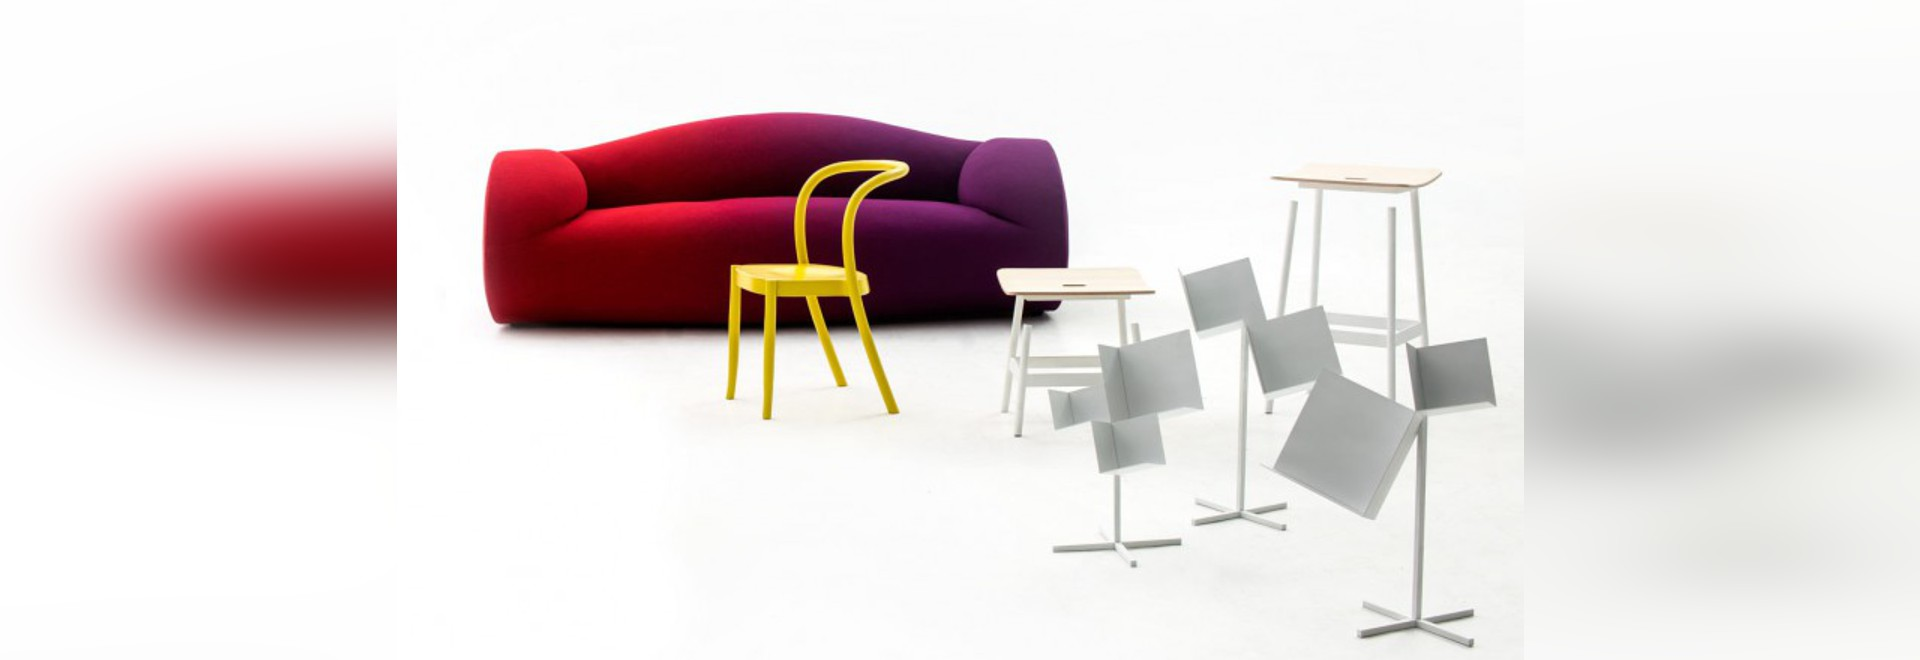 MILAN 2015: MOROSO PREVIEWS NEW DESIGNS FROM RON ARAD & NENDO